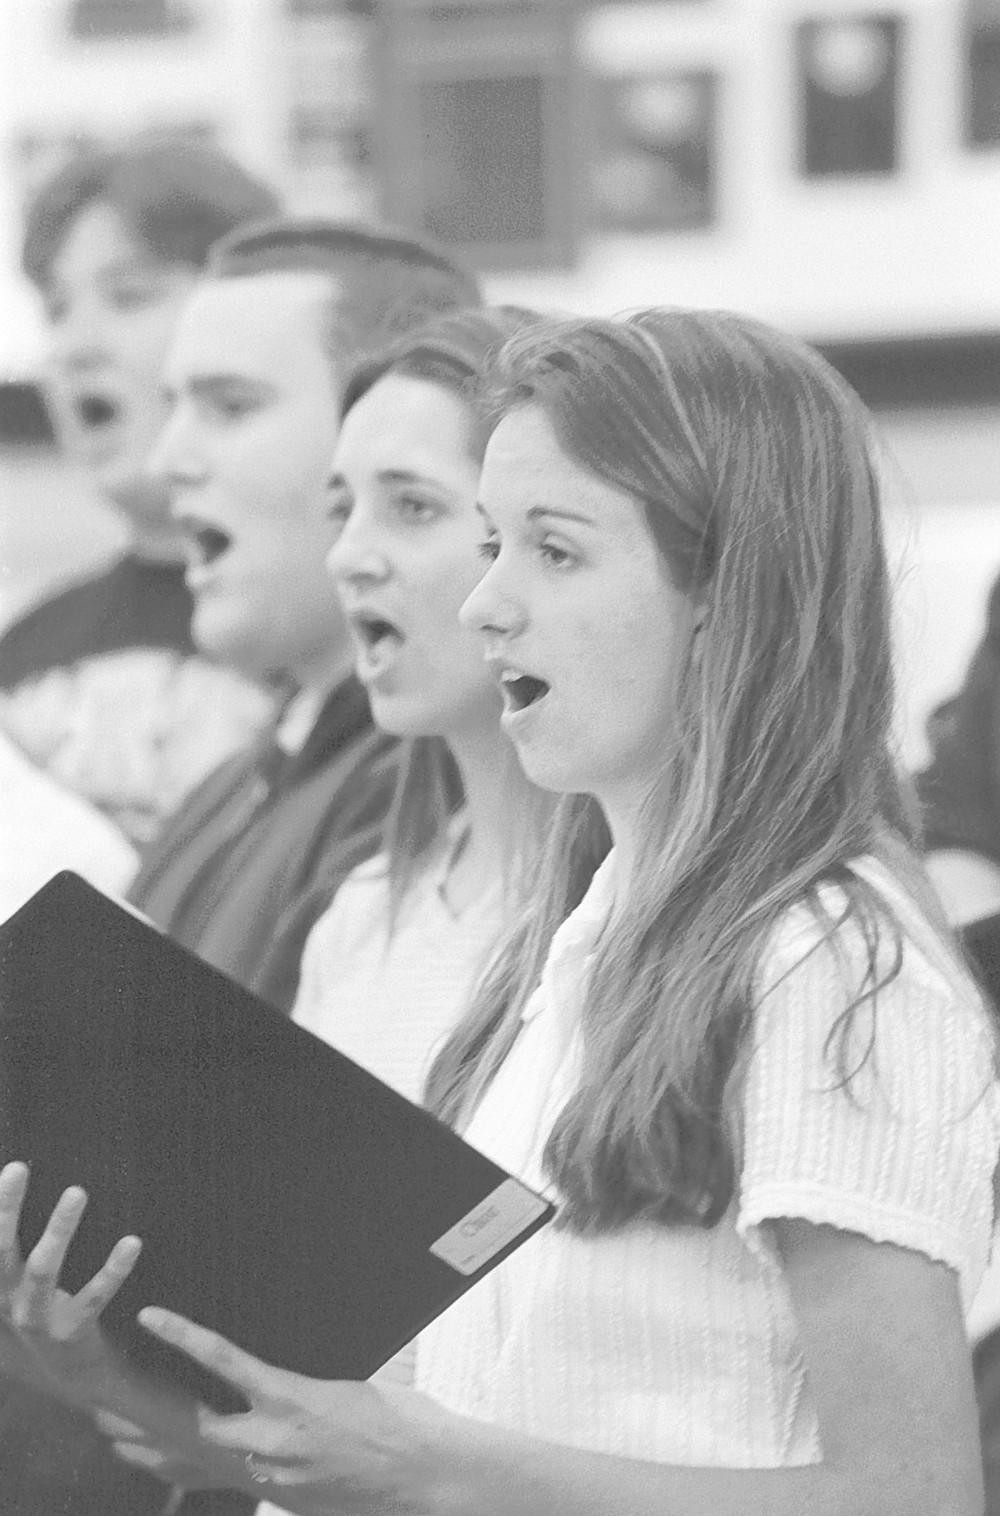 Barbara Fletcher's choir class, Poway High School, The school employs a drug-sniffing dog service.